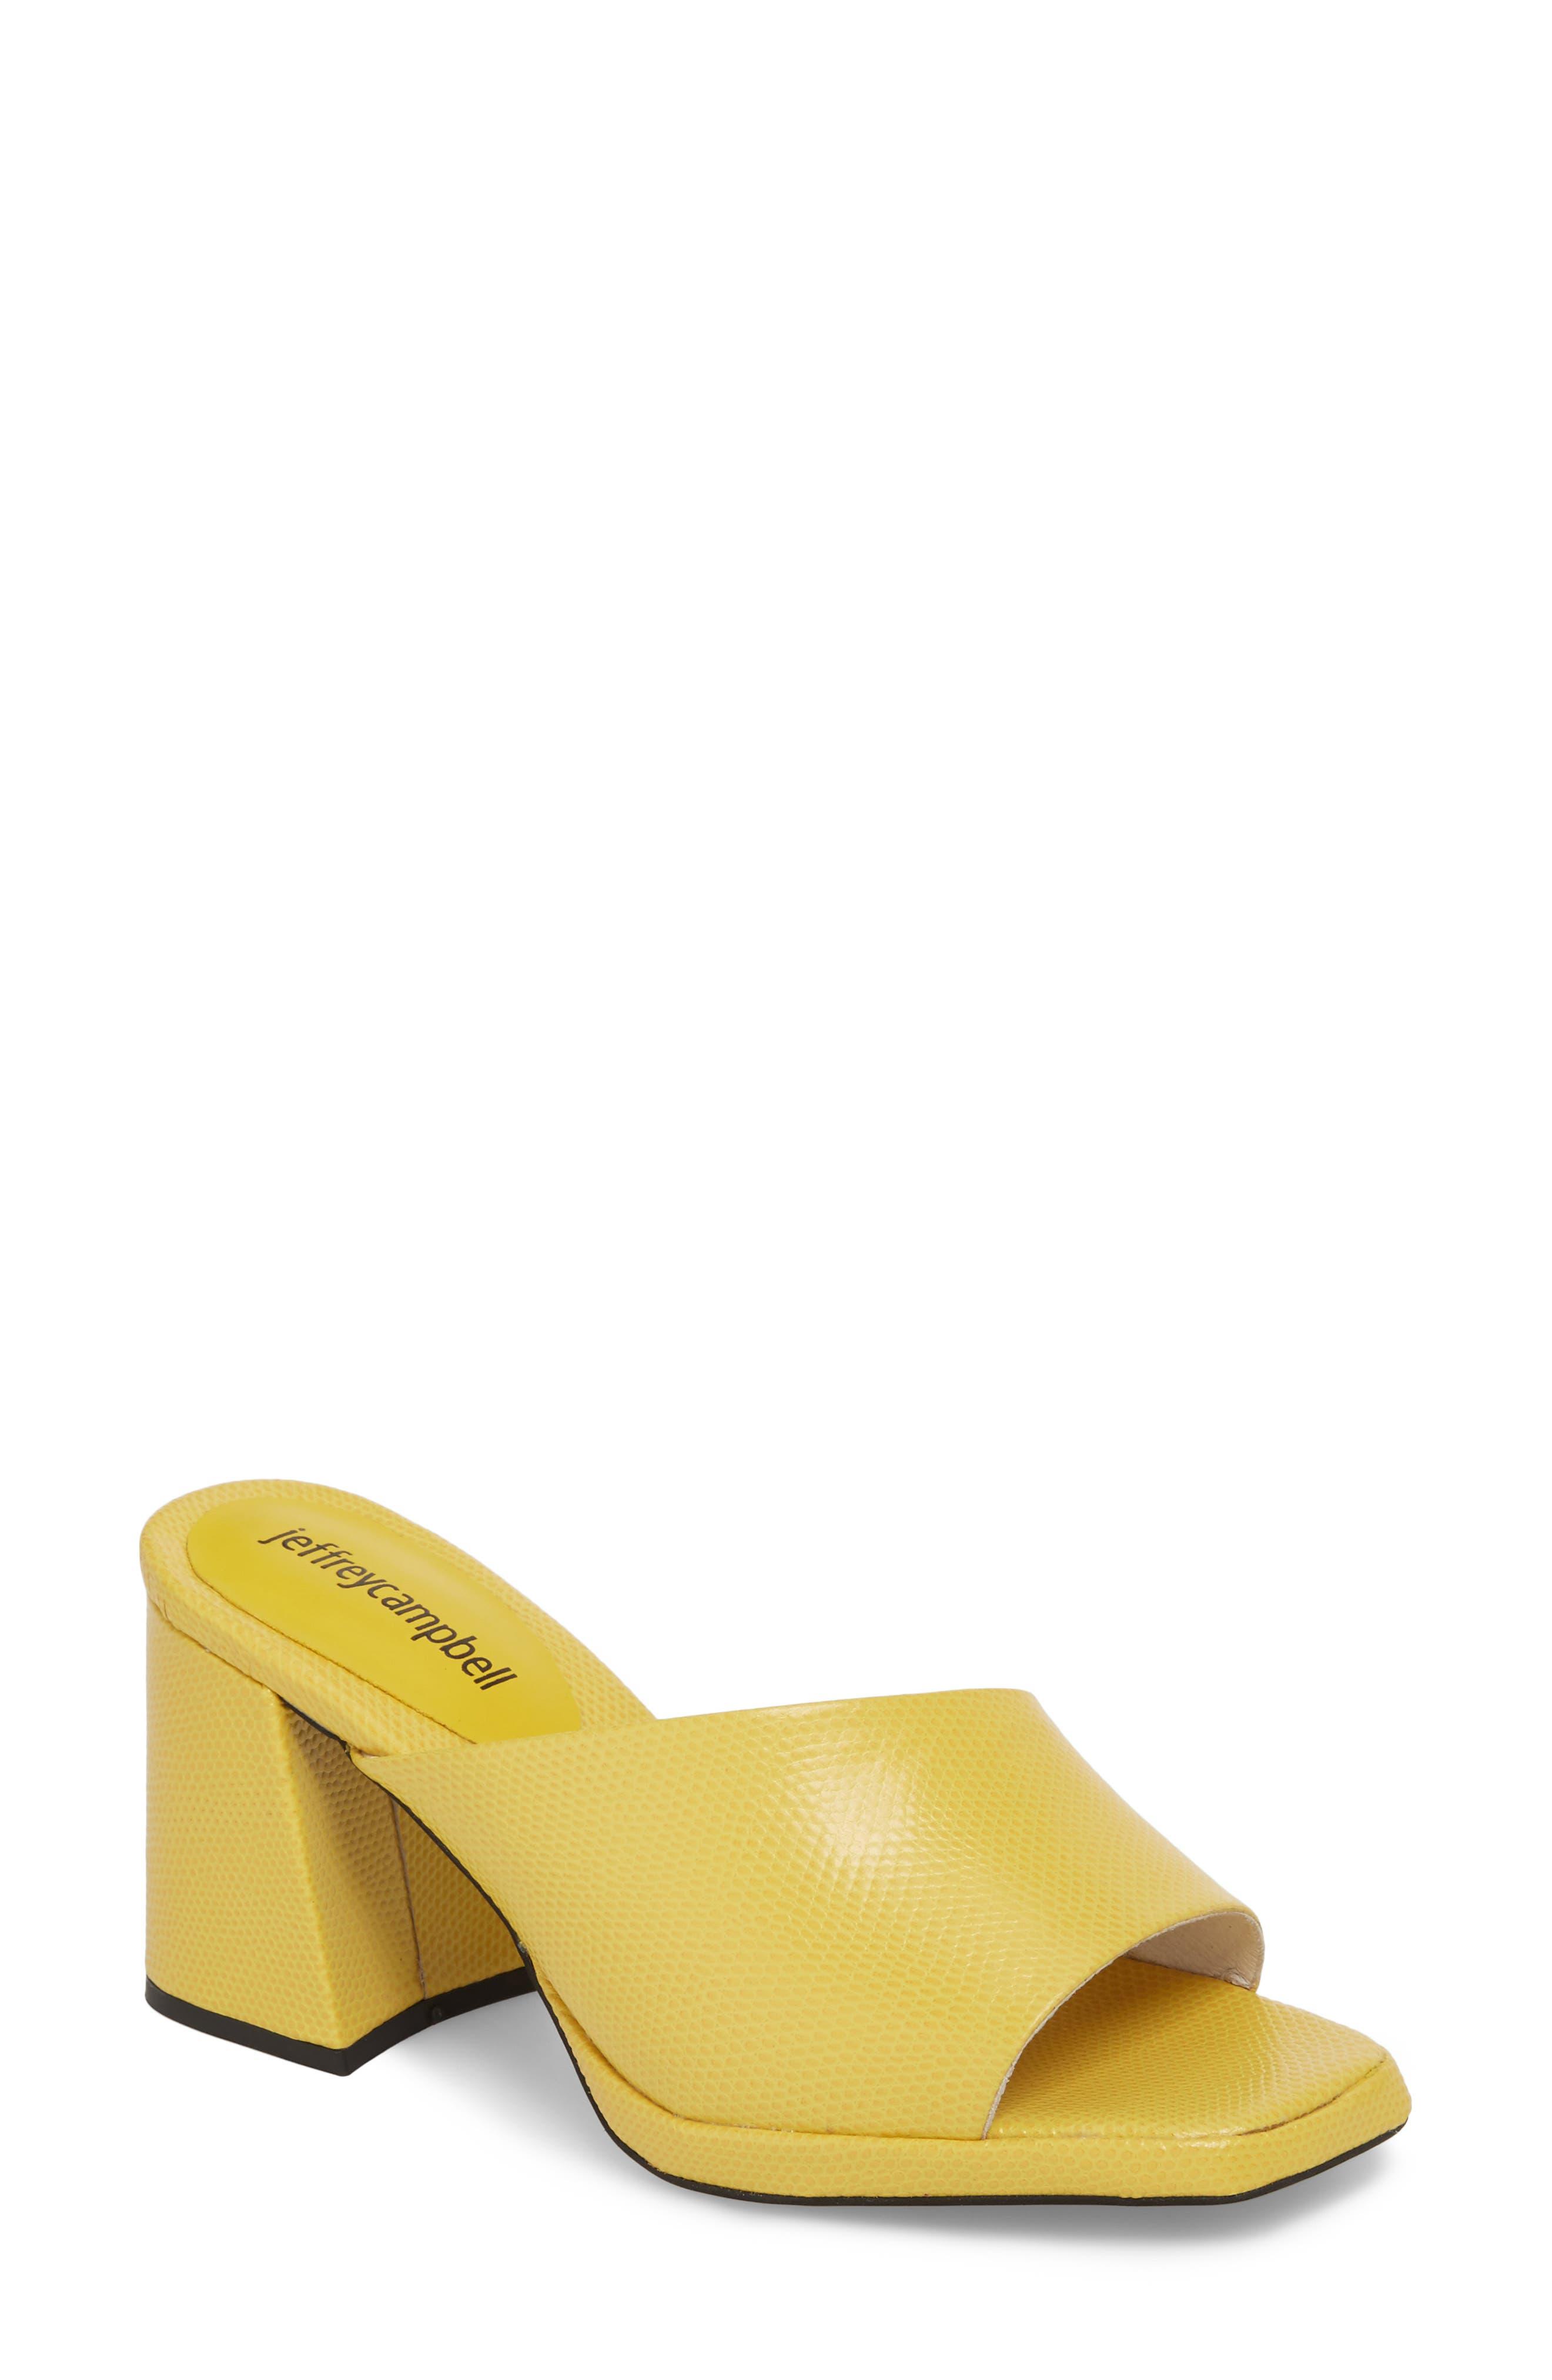 Suzuci Sandal,                             Main thumbnail 1, color,                             Yellow Leather